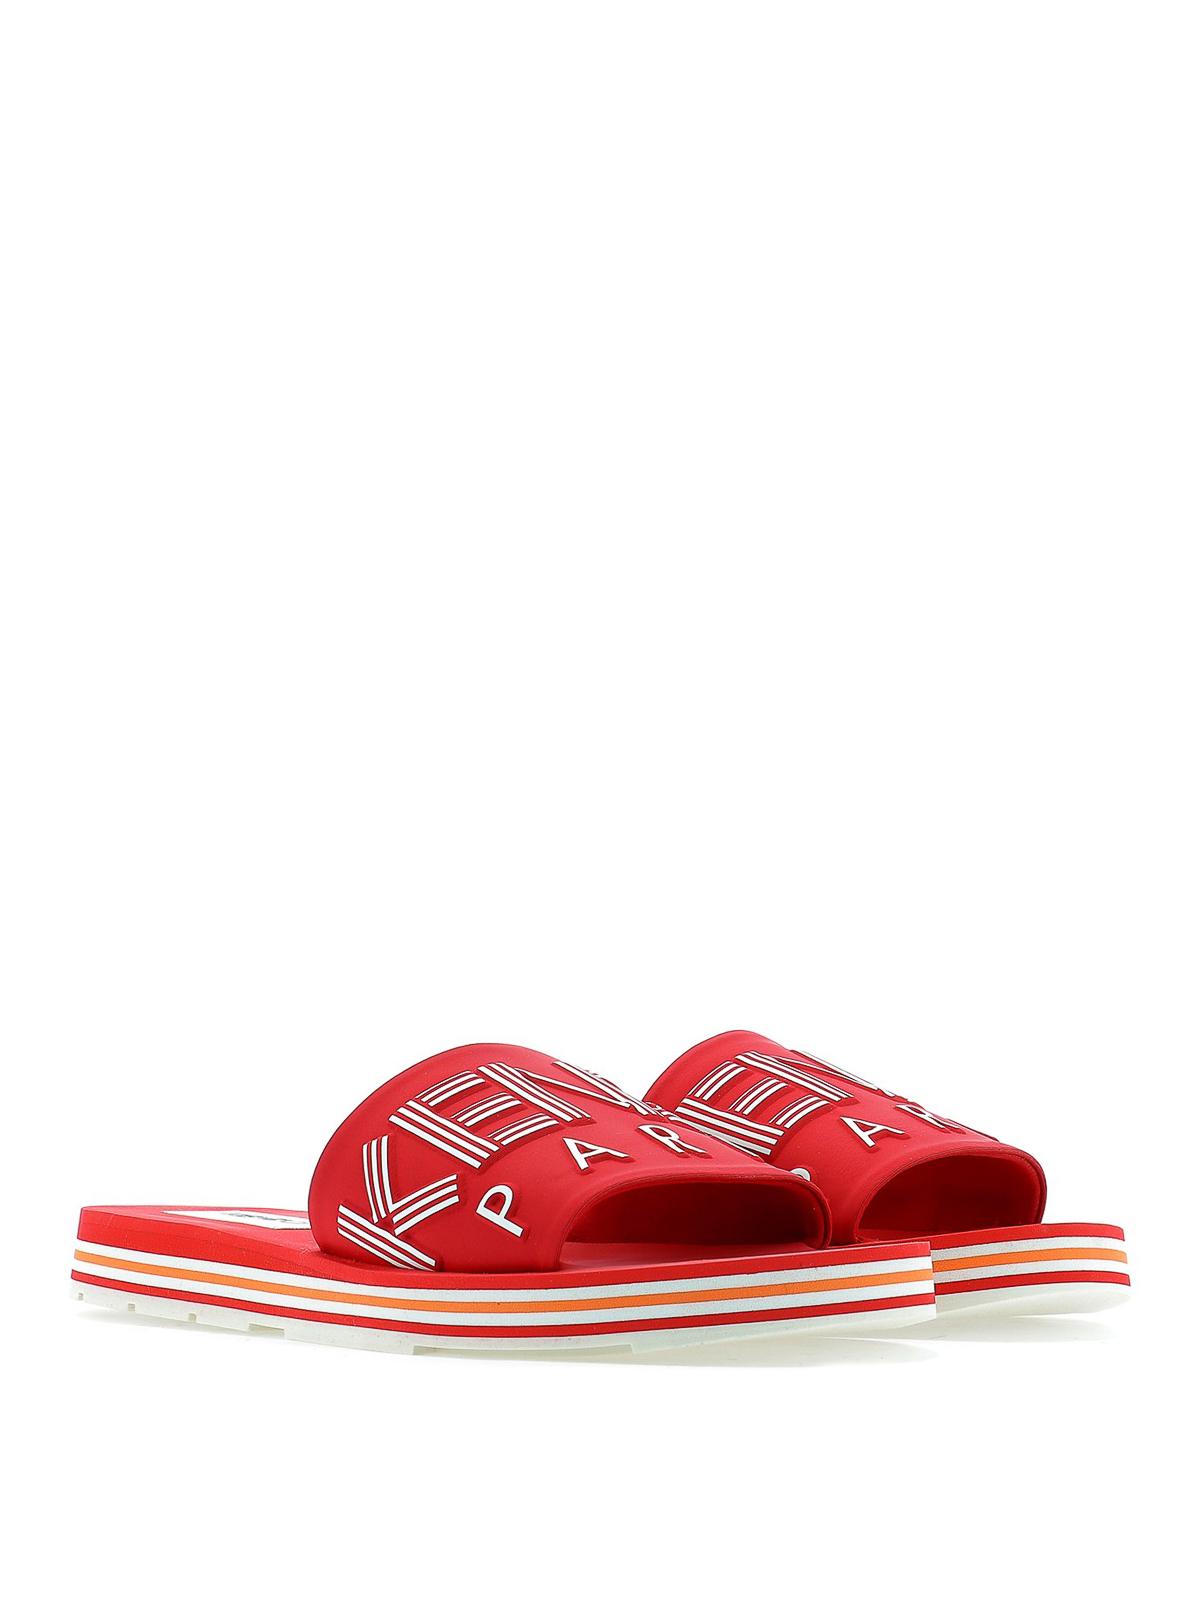 0176492db Kenzo - Red pool slides - sandals - F955MU254F7721   Shop online at ...